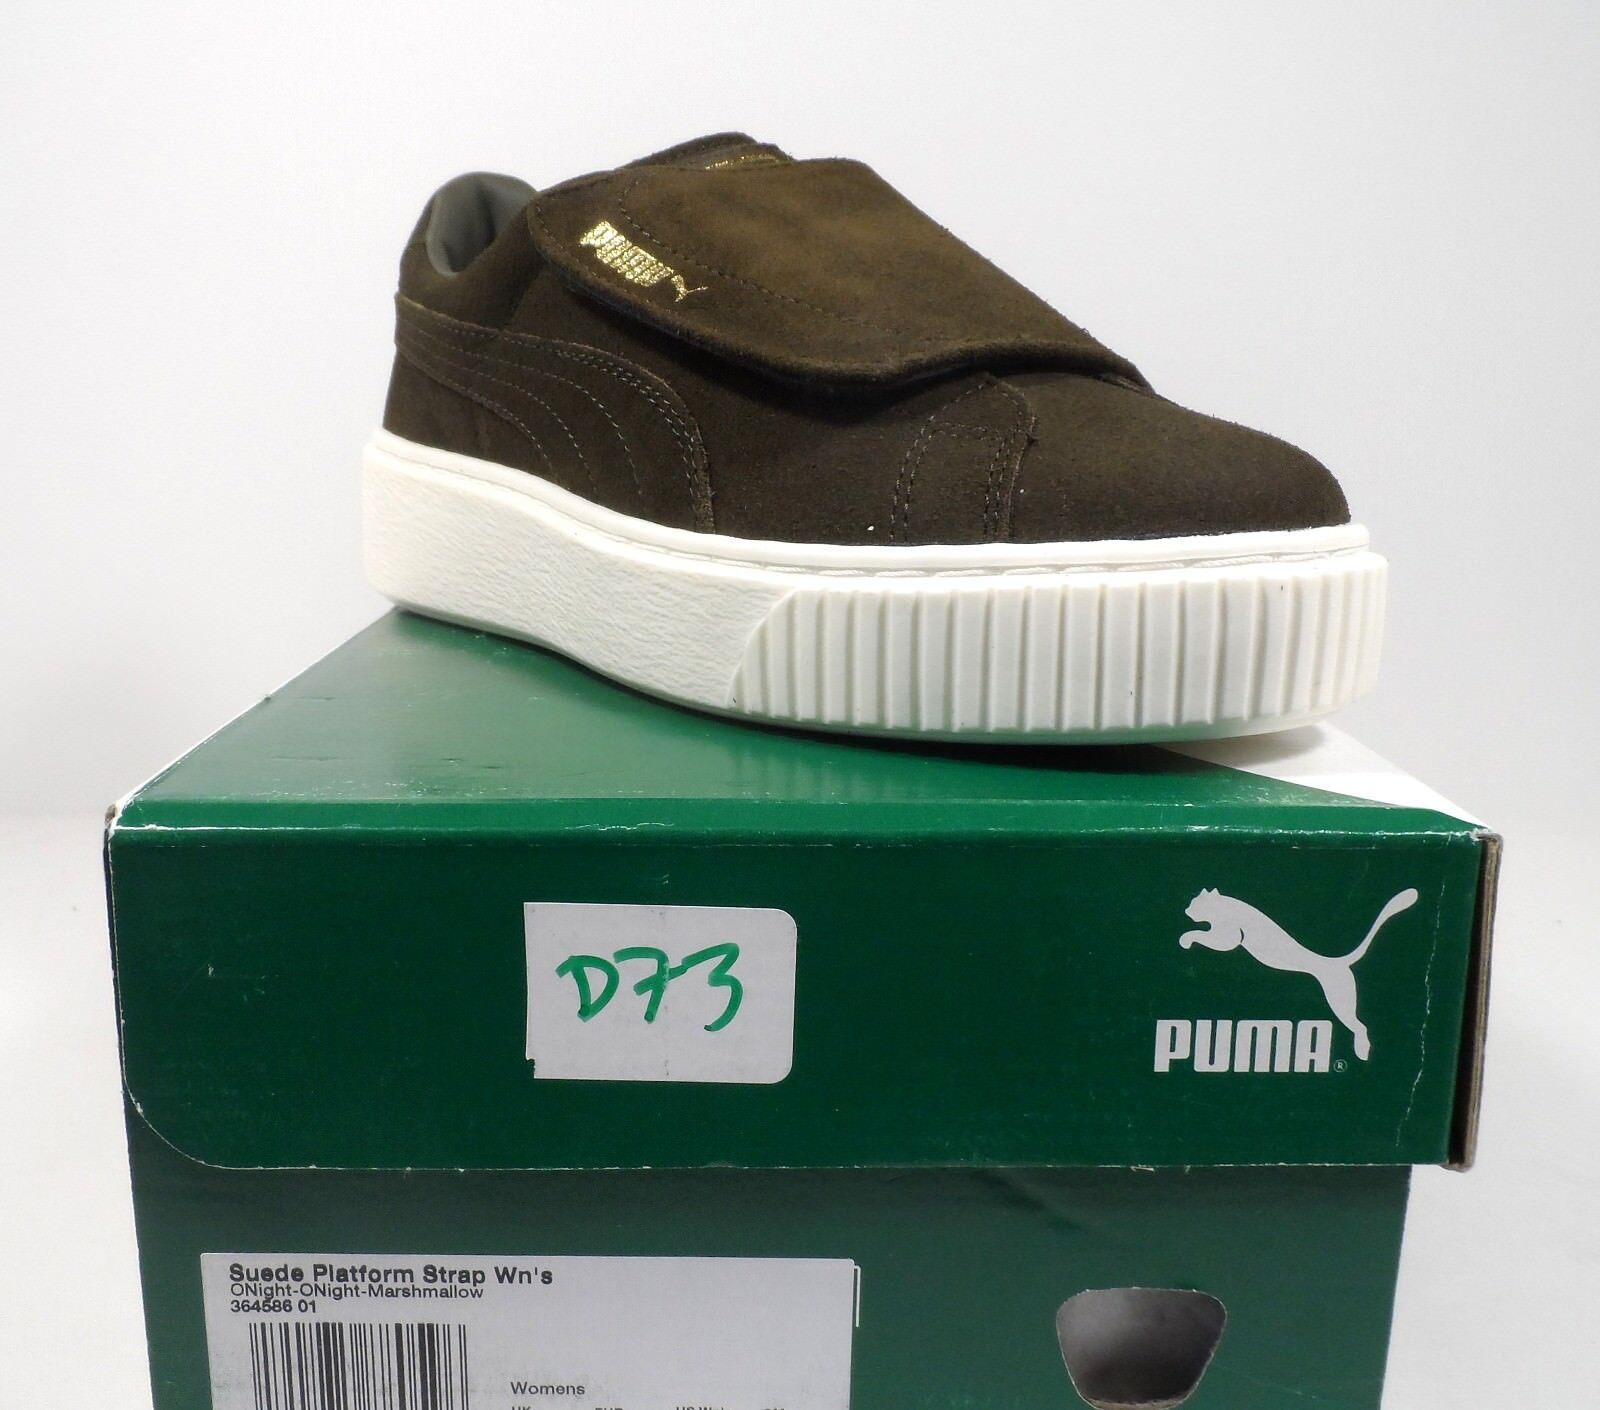 PUMA Women's Suede Platform Strap WN Sneaker Olive Night Marshmallow Size 7